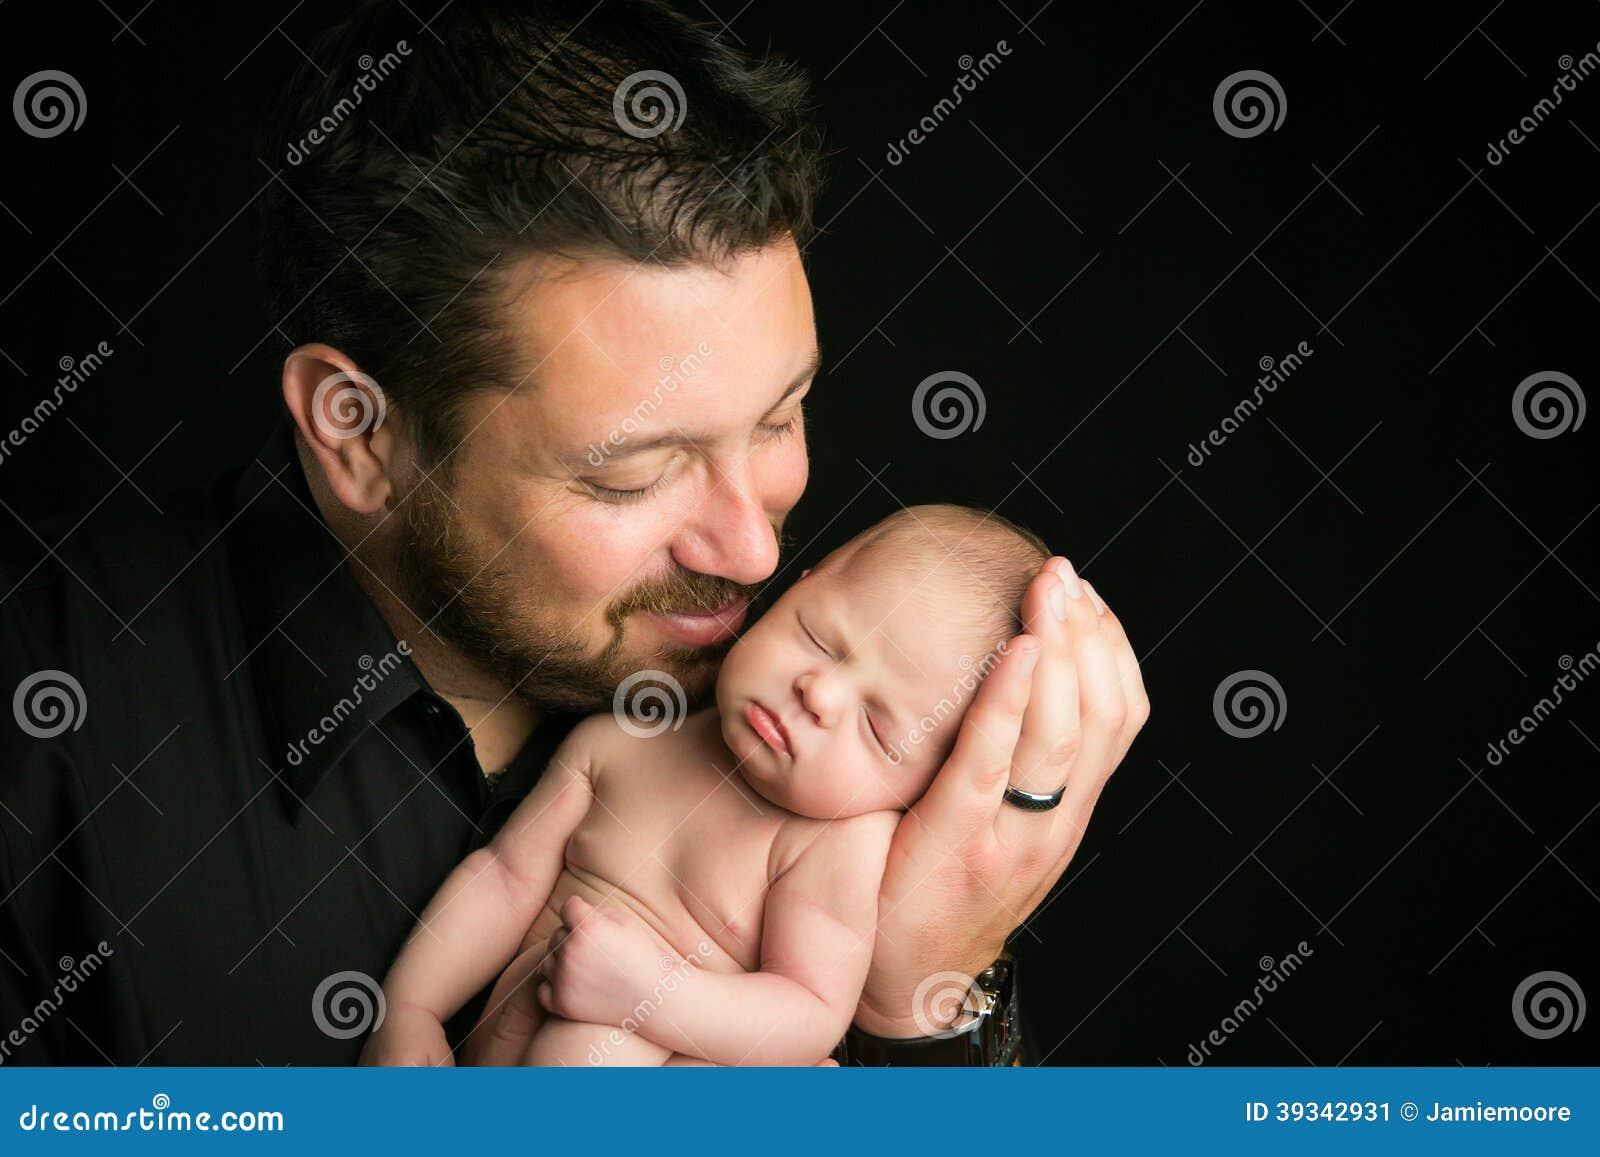 Vati mit neugeborenem Baby